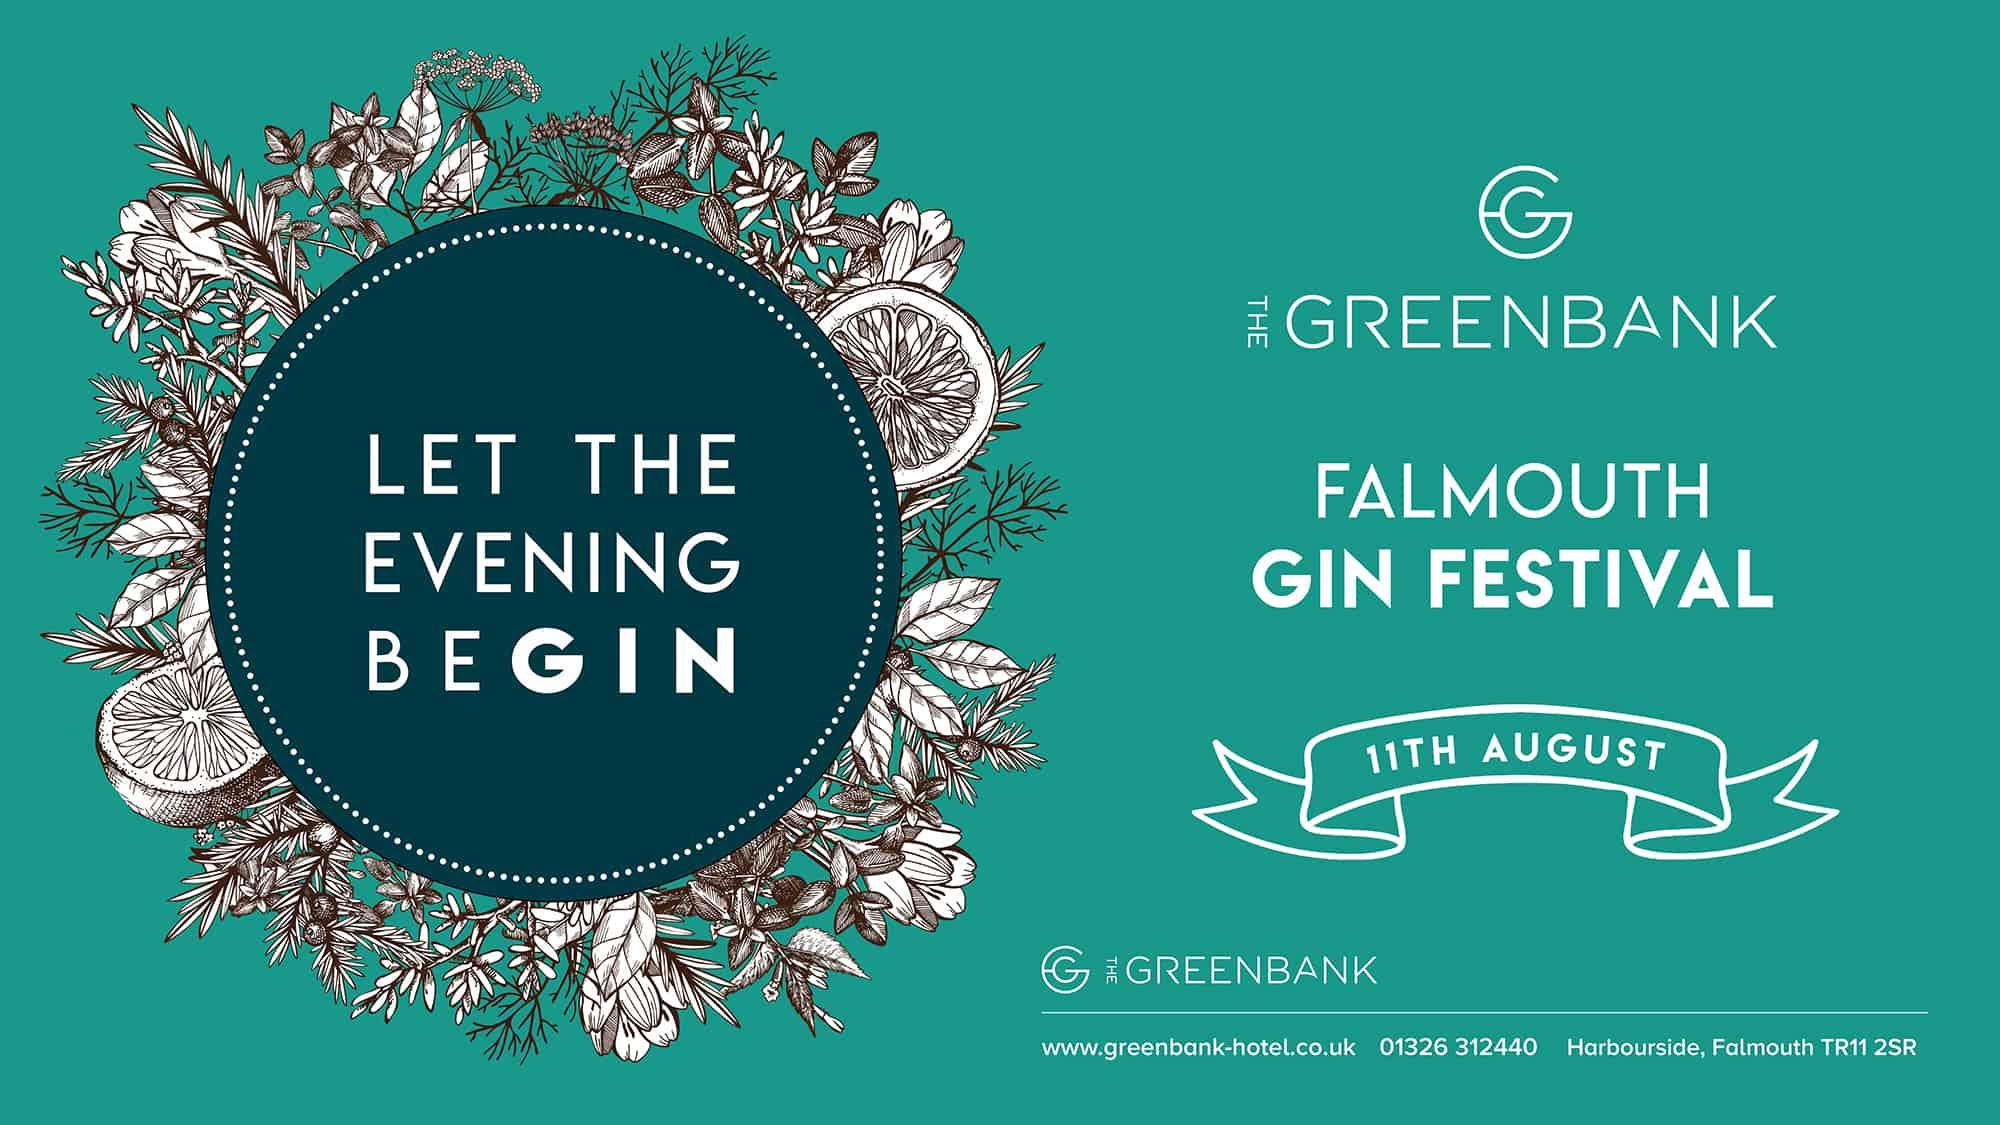 gin-festival-falmouth-greenbank-hotel-cornwall